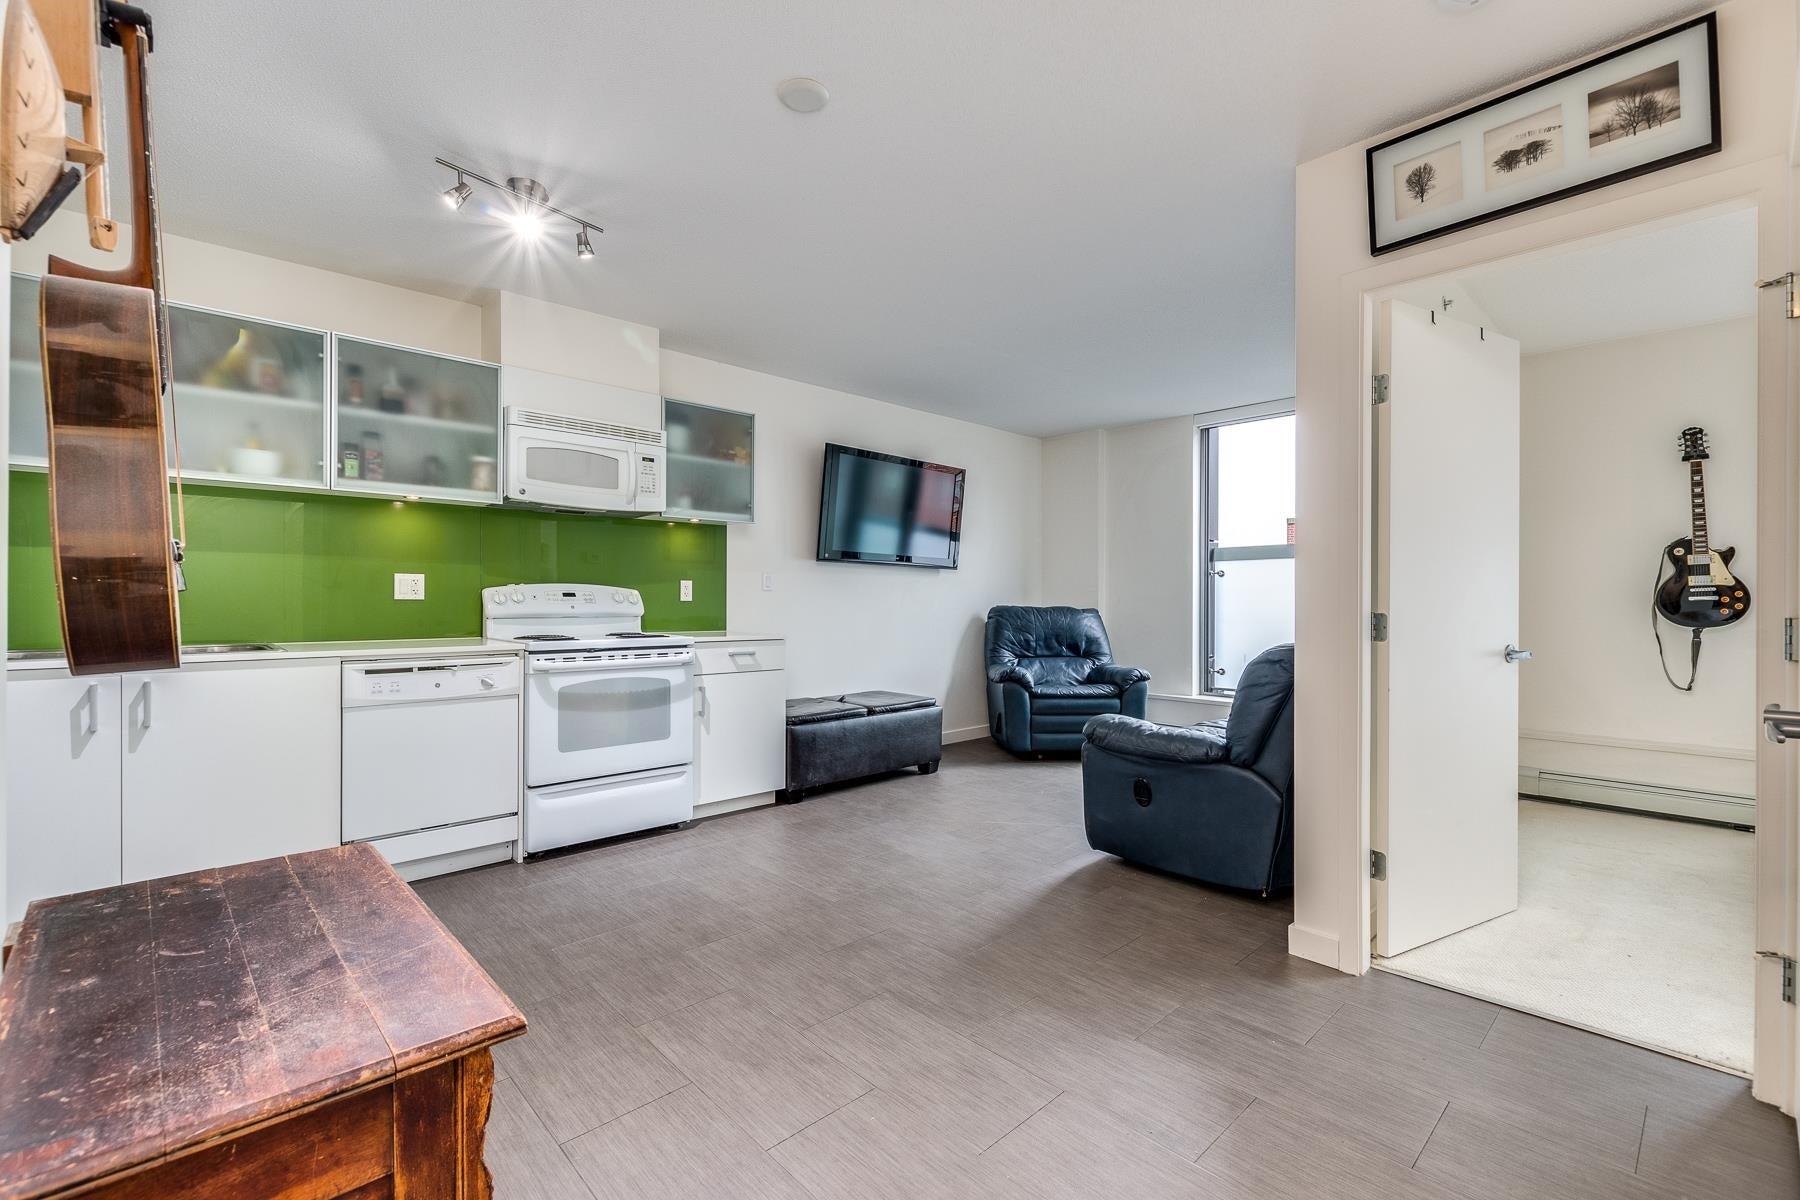 608 66 W CORDOVA STREET - Downtown VW Apartment/Condo for sale, 1 Bedroom (R2626745) - #1